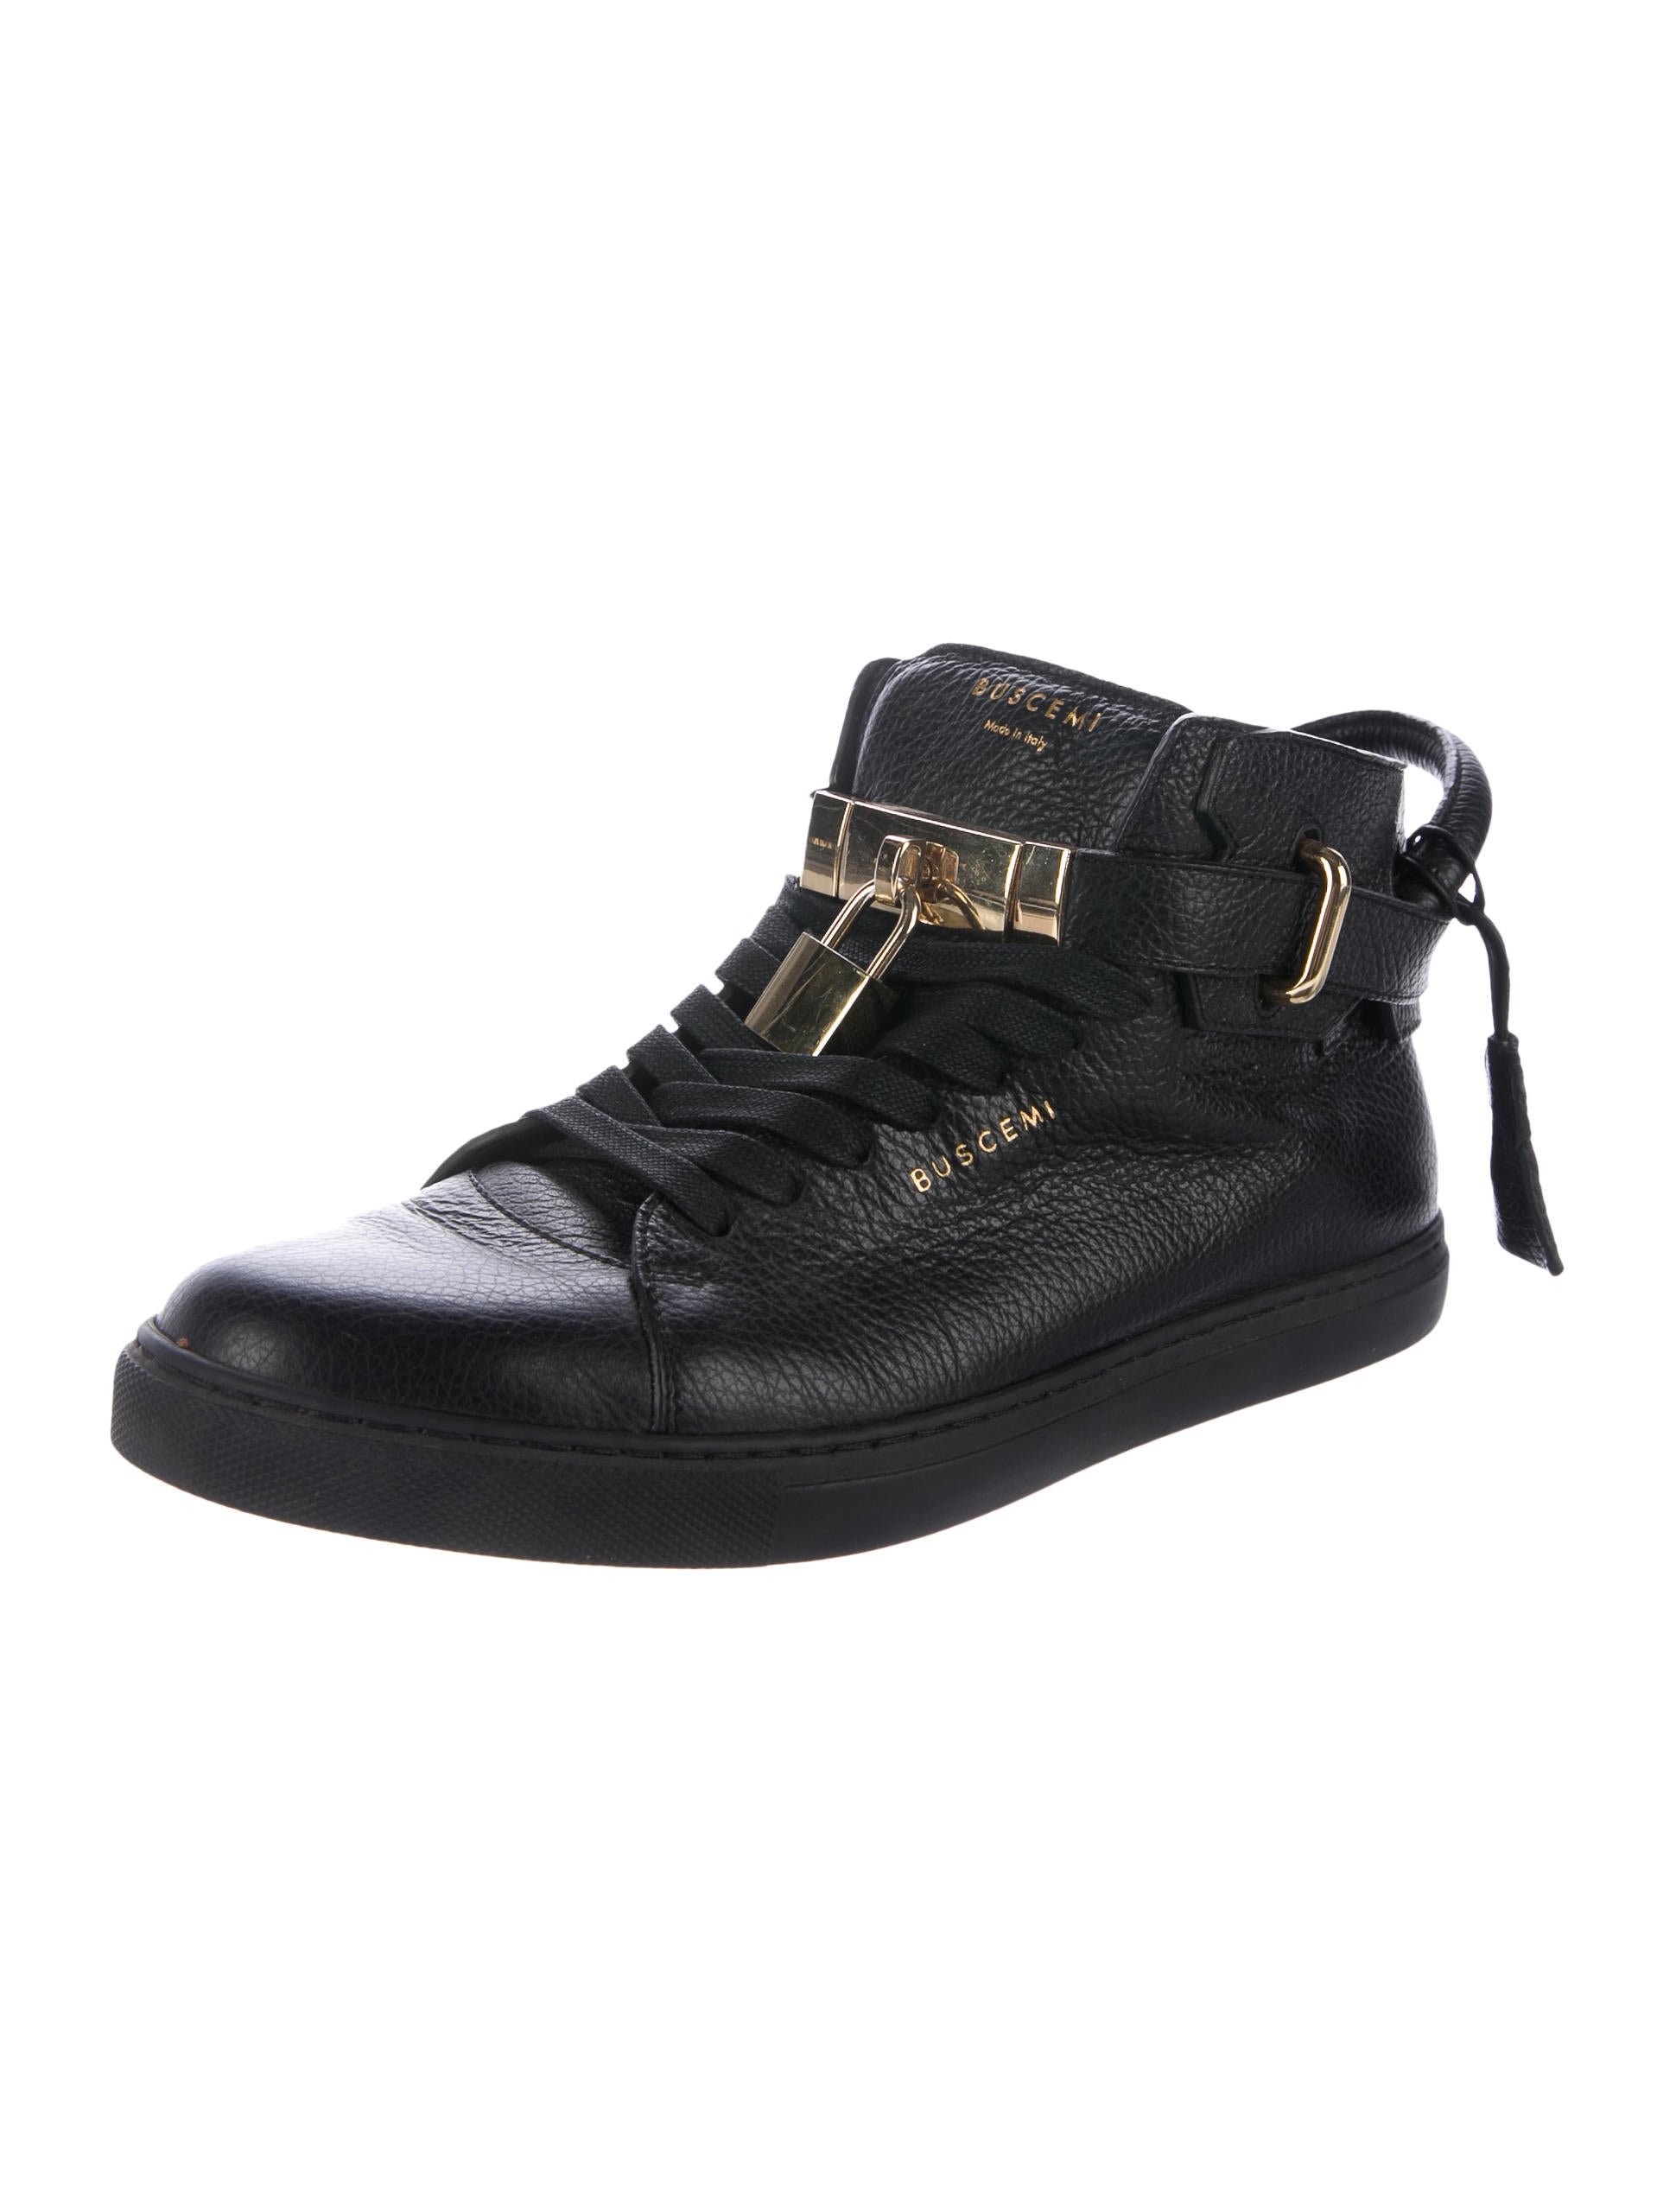 Bsi Black Gold Shoes